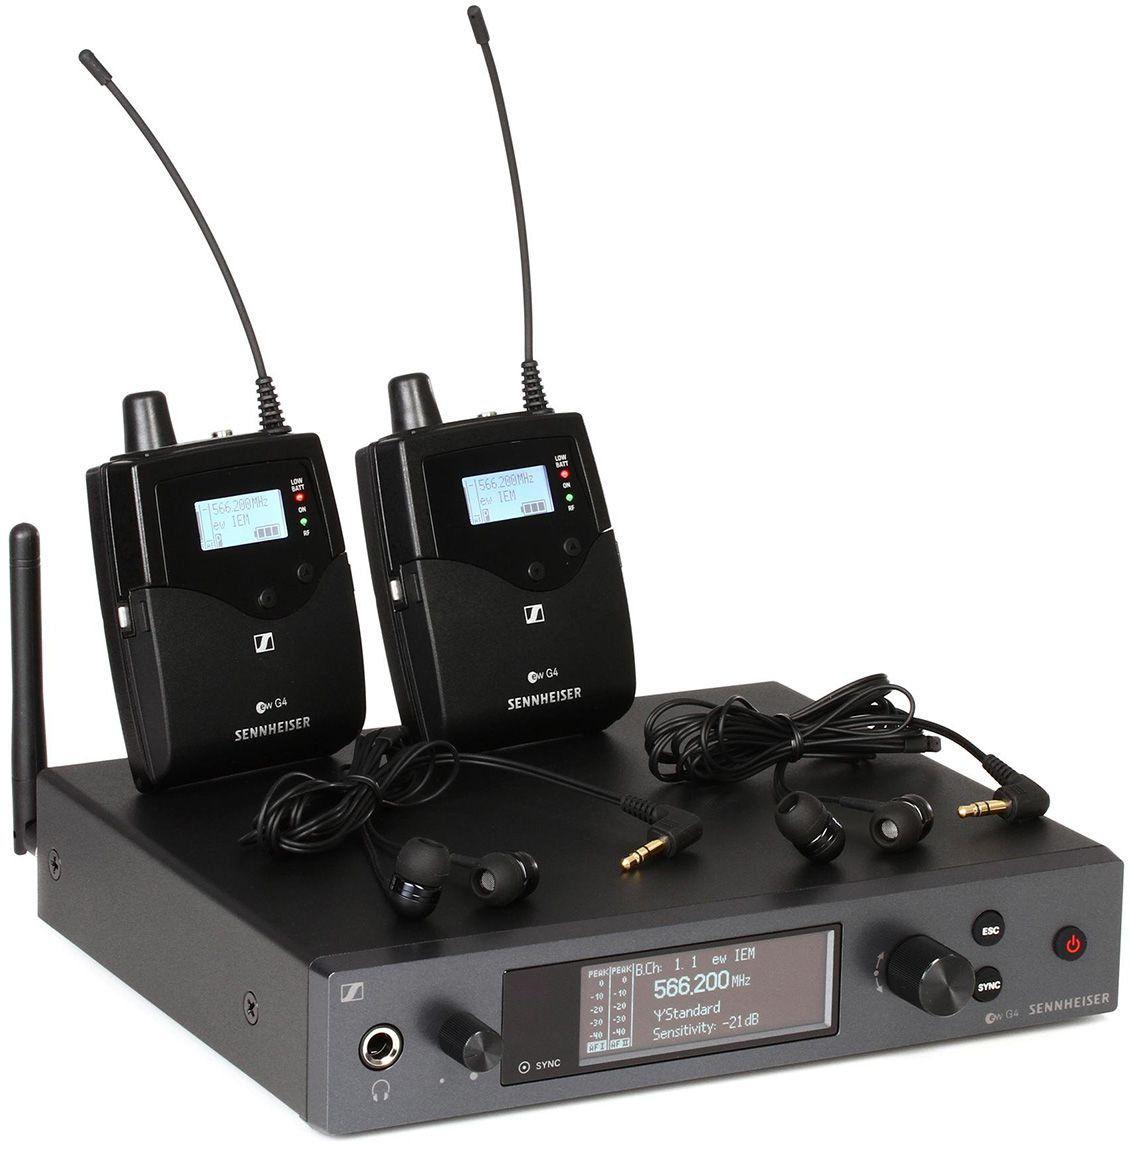 Sennheiser EW IEM G4-Twin Sistema para Monitoramento EW IEM G4-TWIN Dual